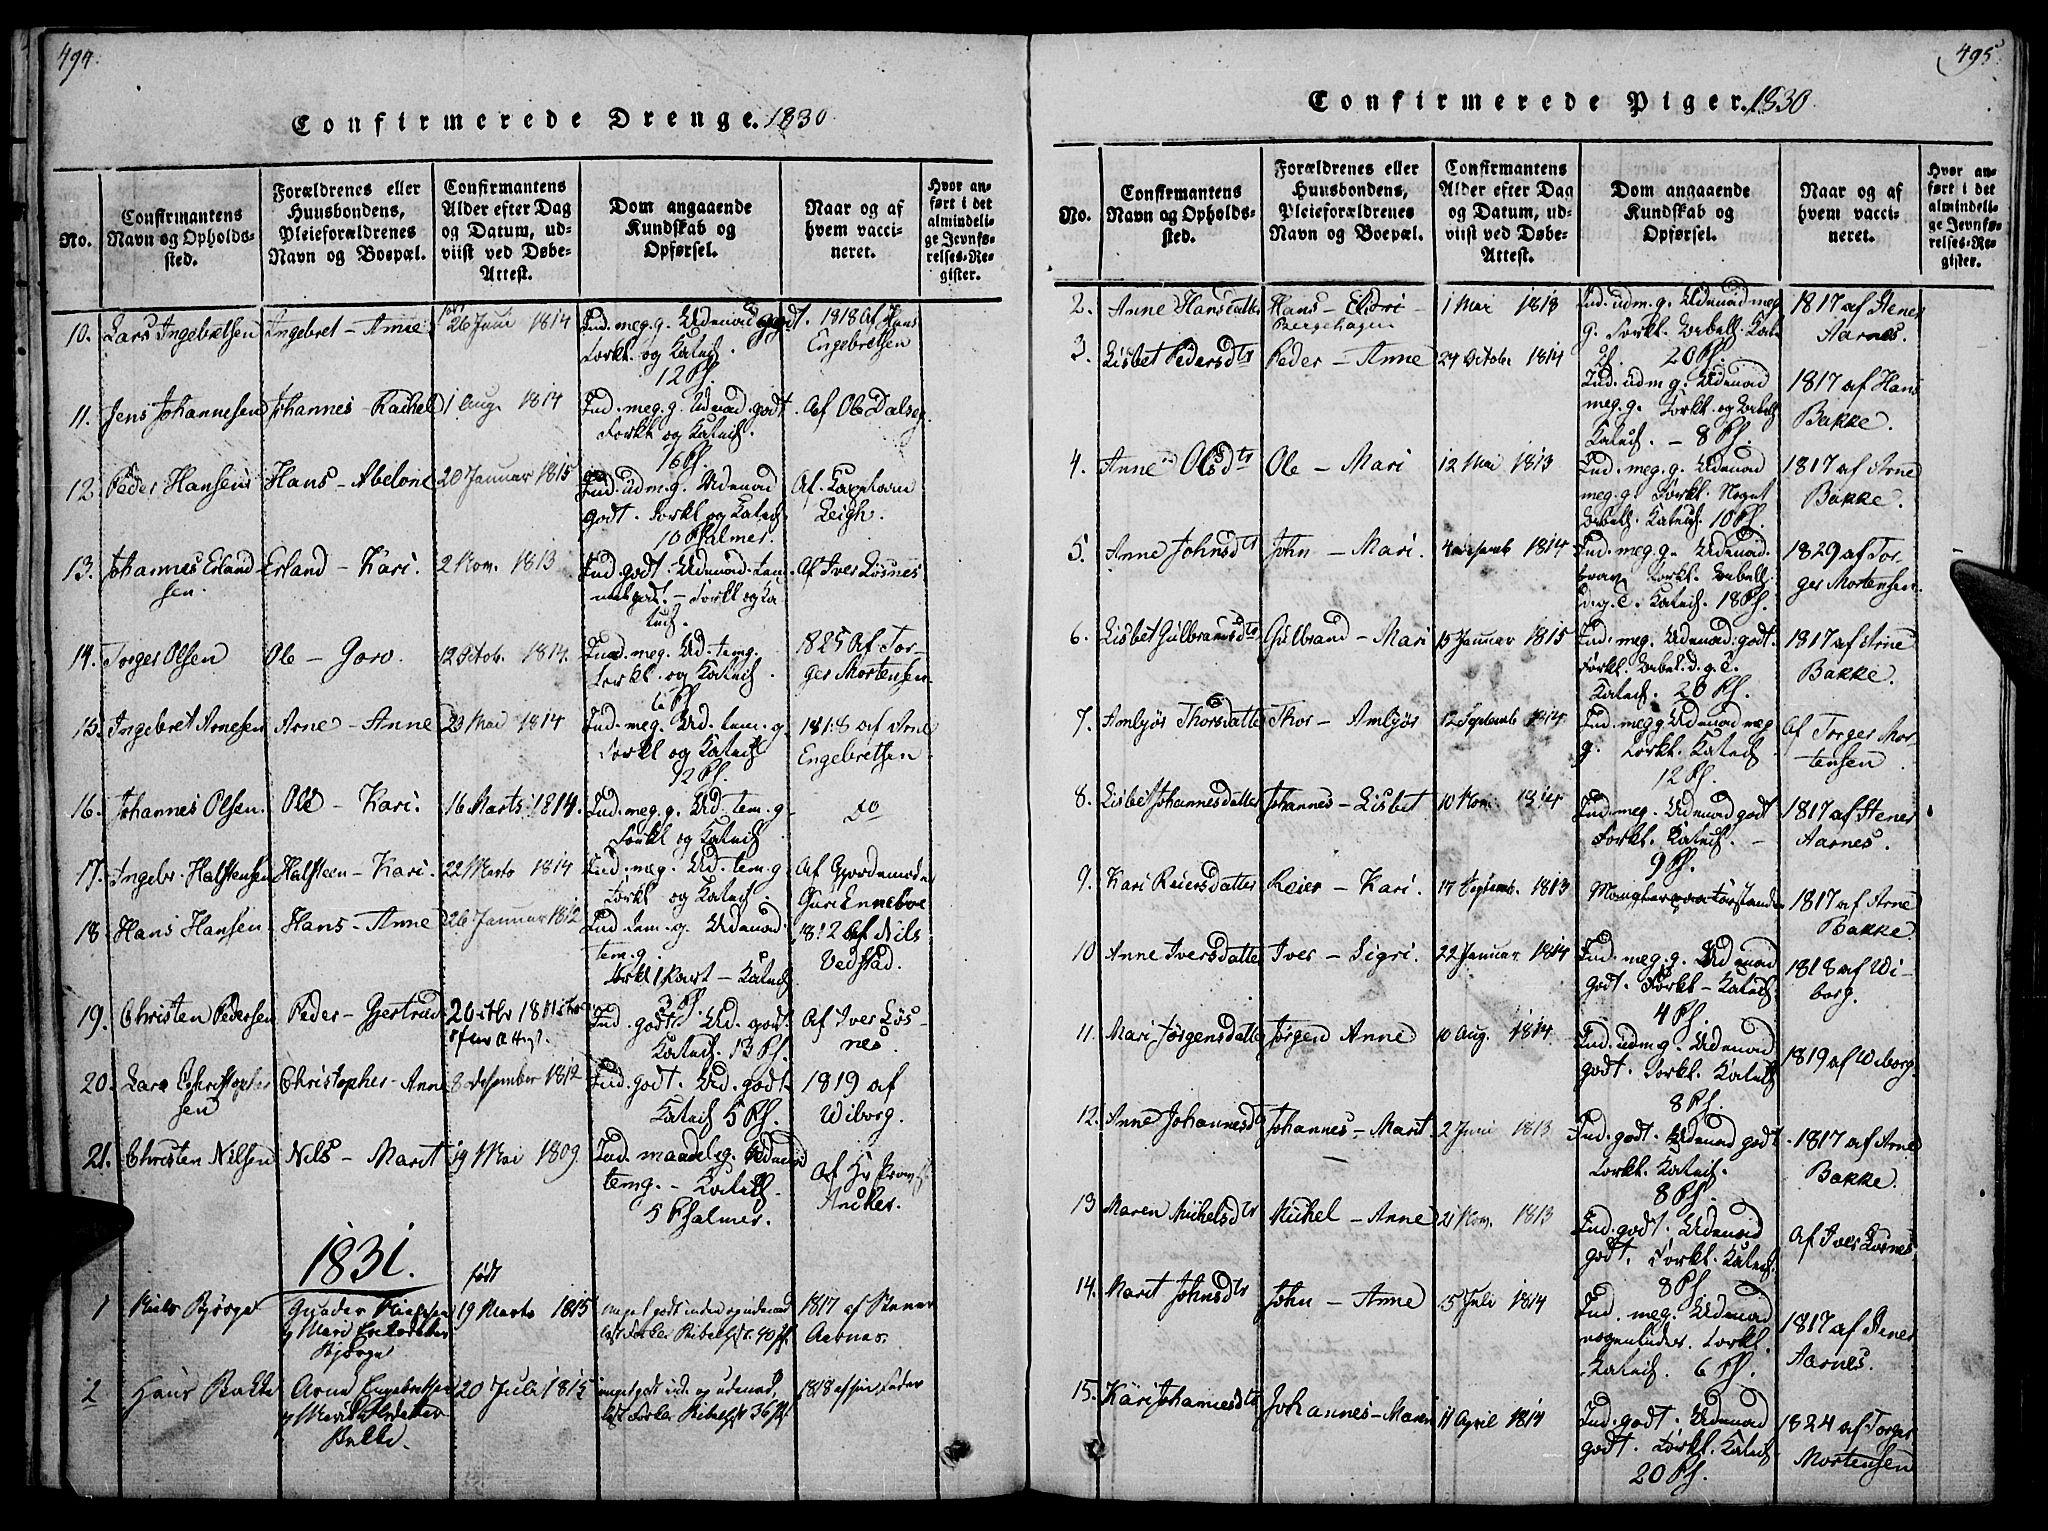 SAH, Ringebu prestekontor, Ministerialbok nr. 4, 1821-1839, s. 494-495